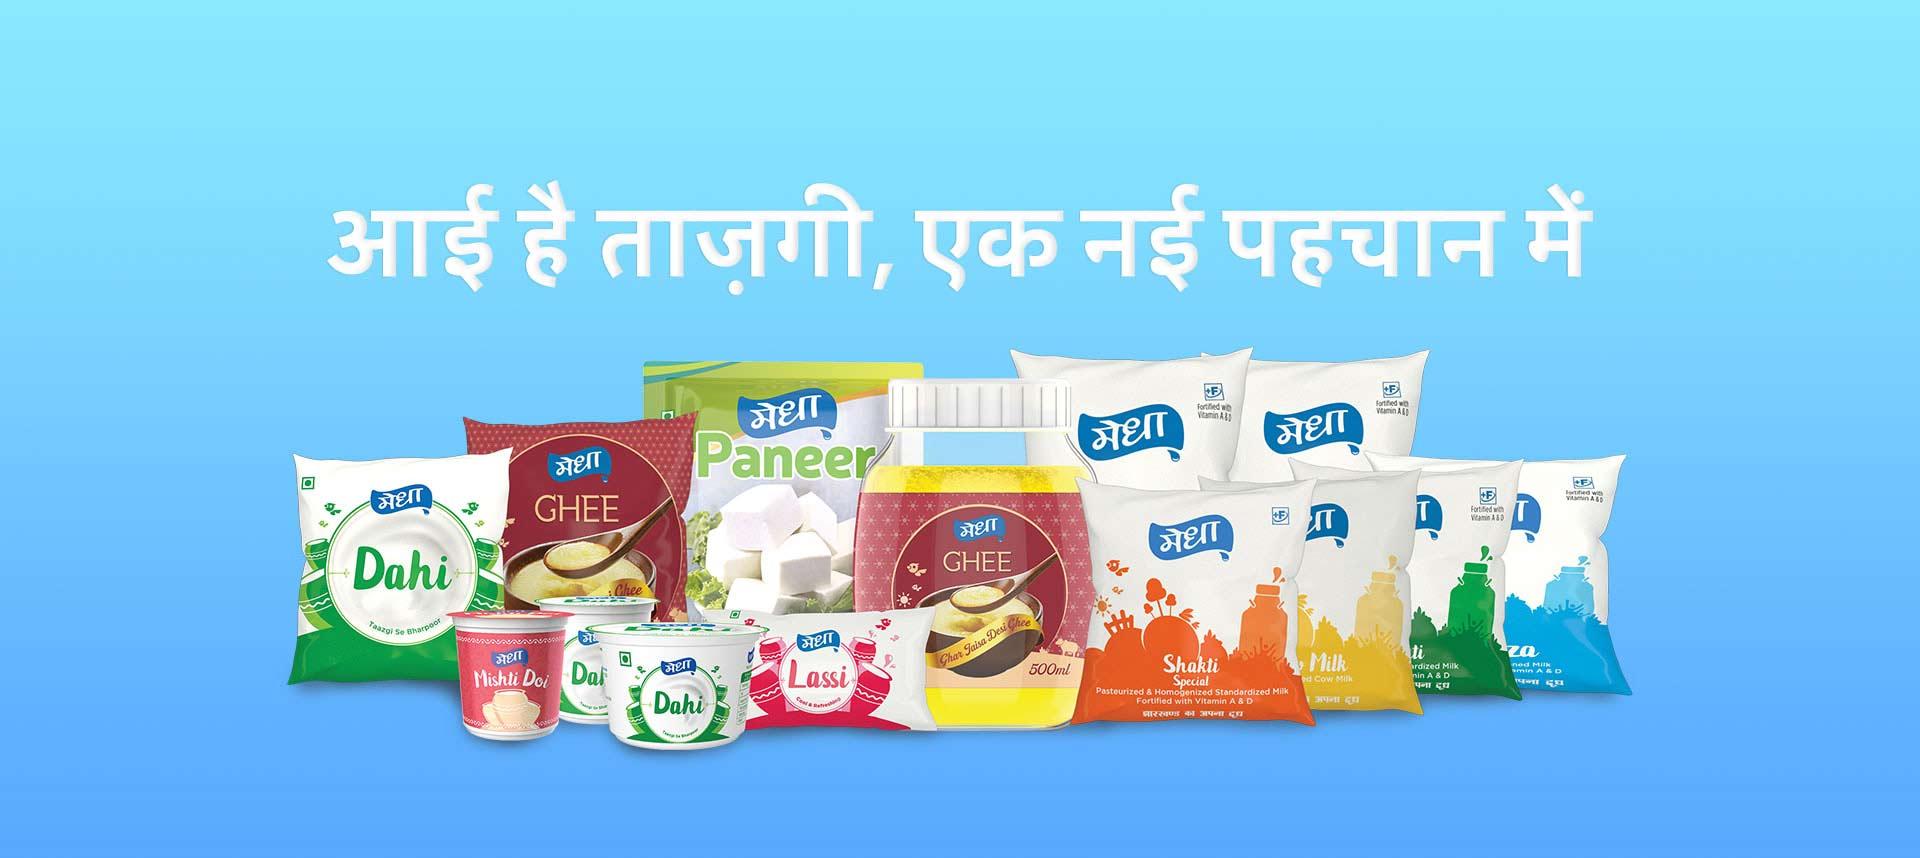 Medha Milk Products Range